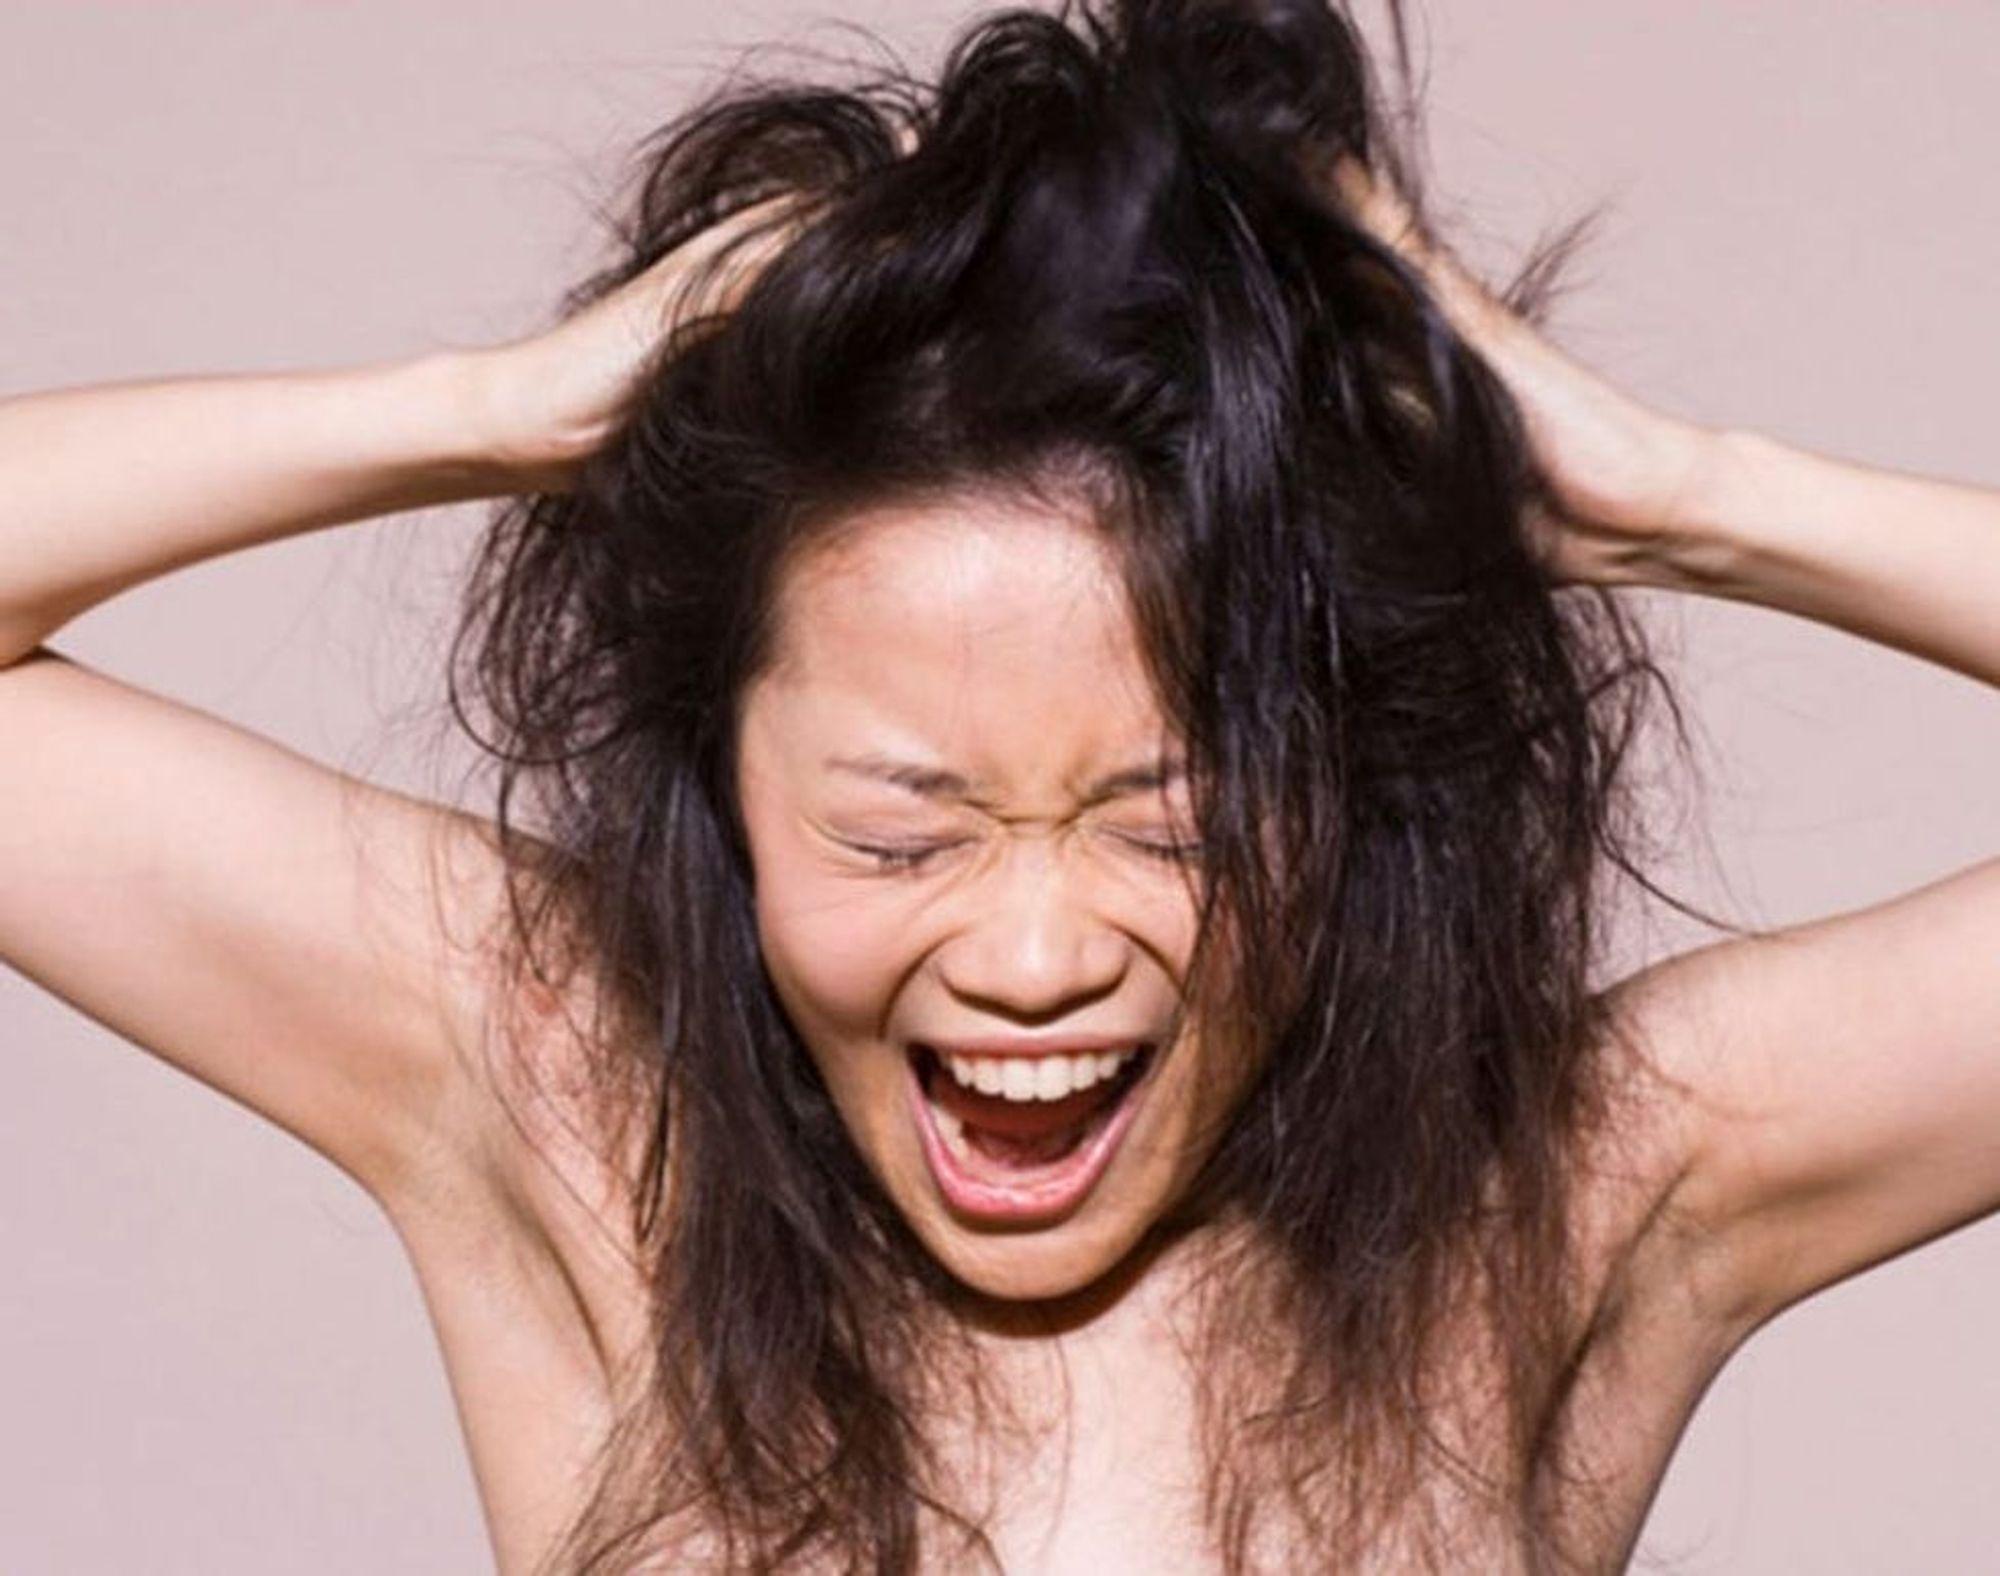 Hair SOS: 12 Tips for Repairing Dry Hair